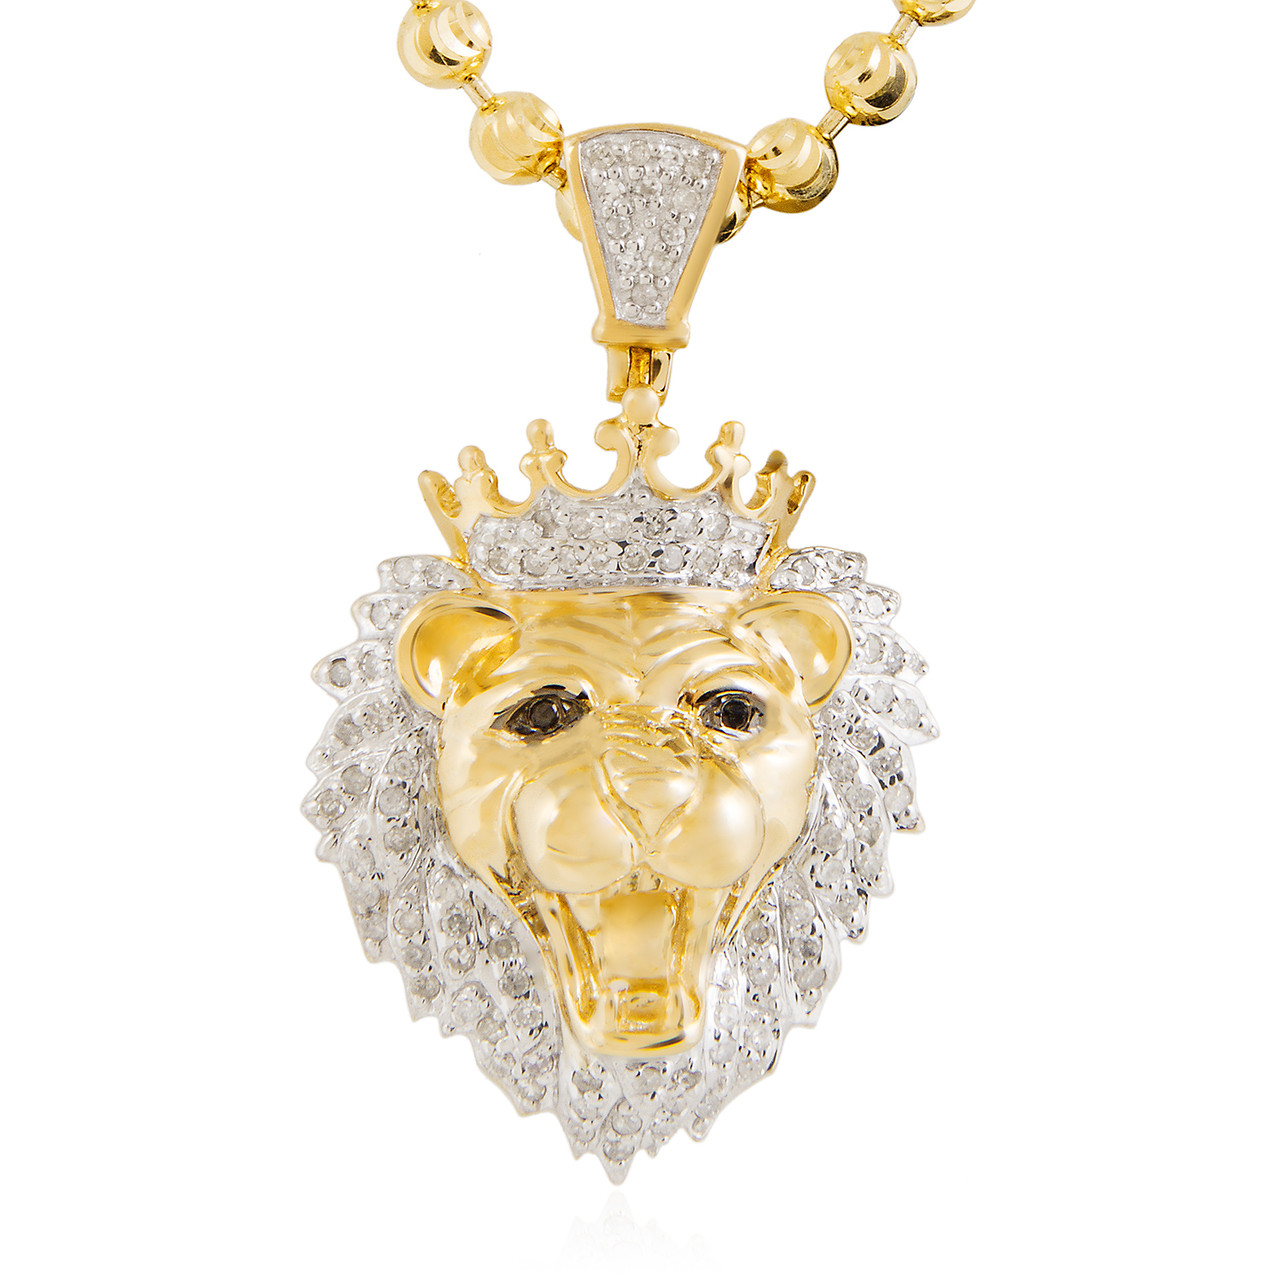 10k Yellow Gold .36ct Lions Head Pendant - Shyne Jewelers 0a58e138e7